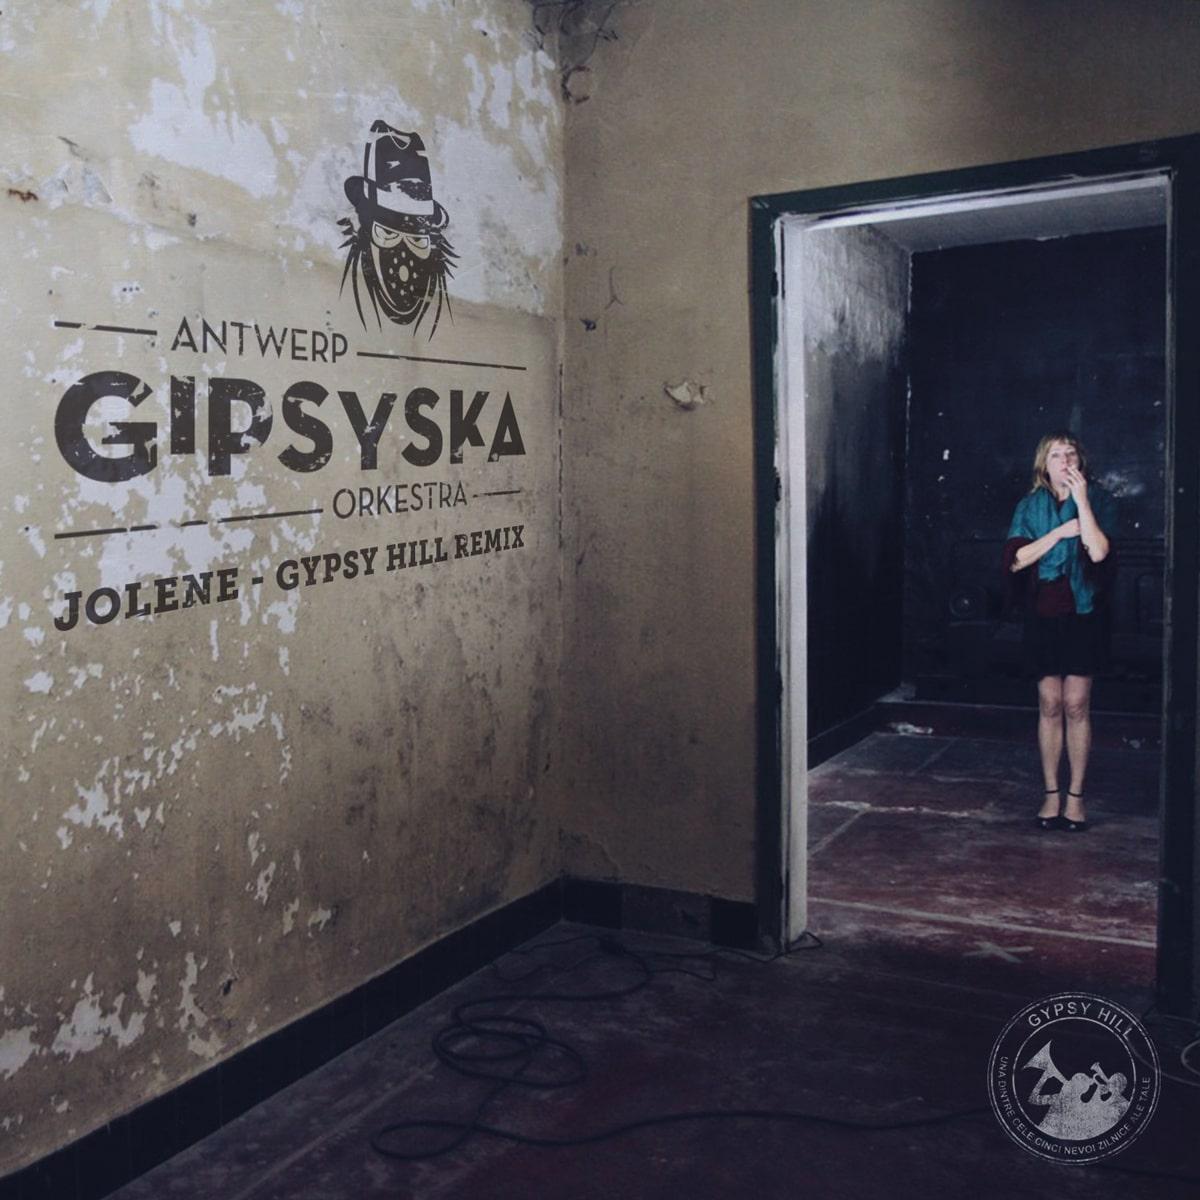 Antwerp Gipsy-Ska Orkestra - Jolene (Gypsy Hill Remix) 3